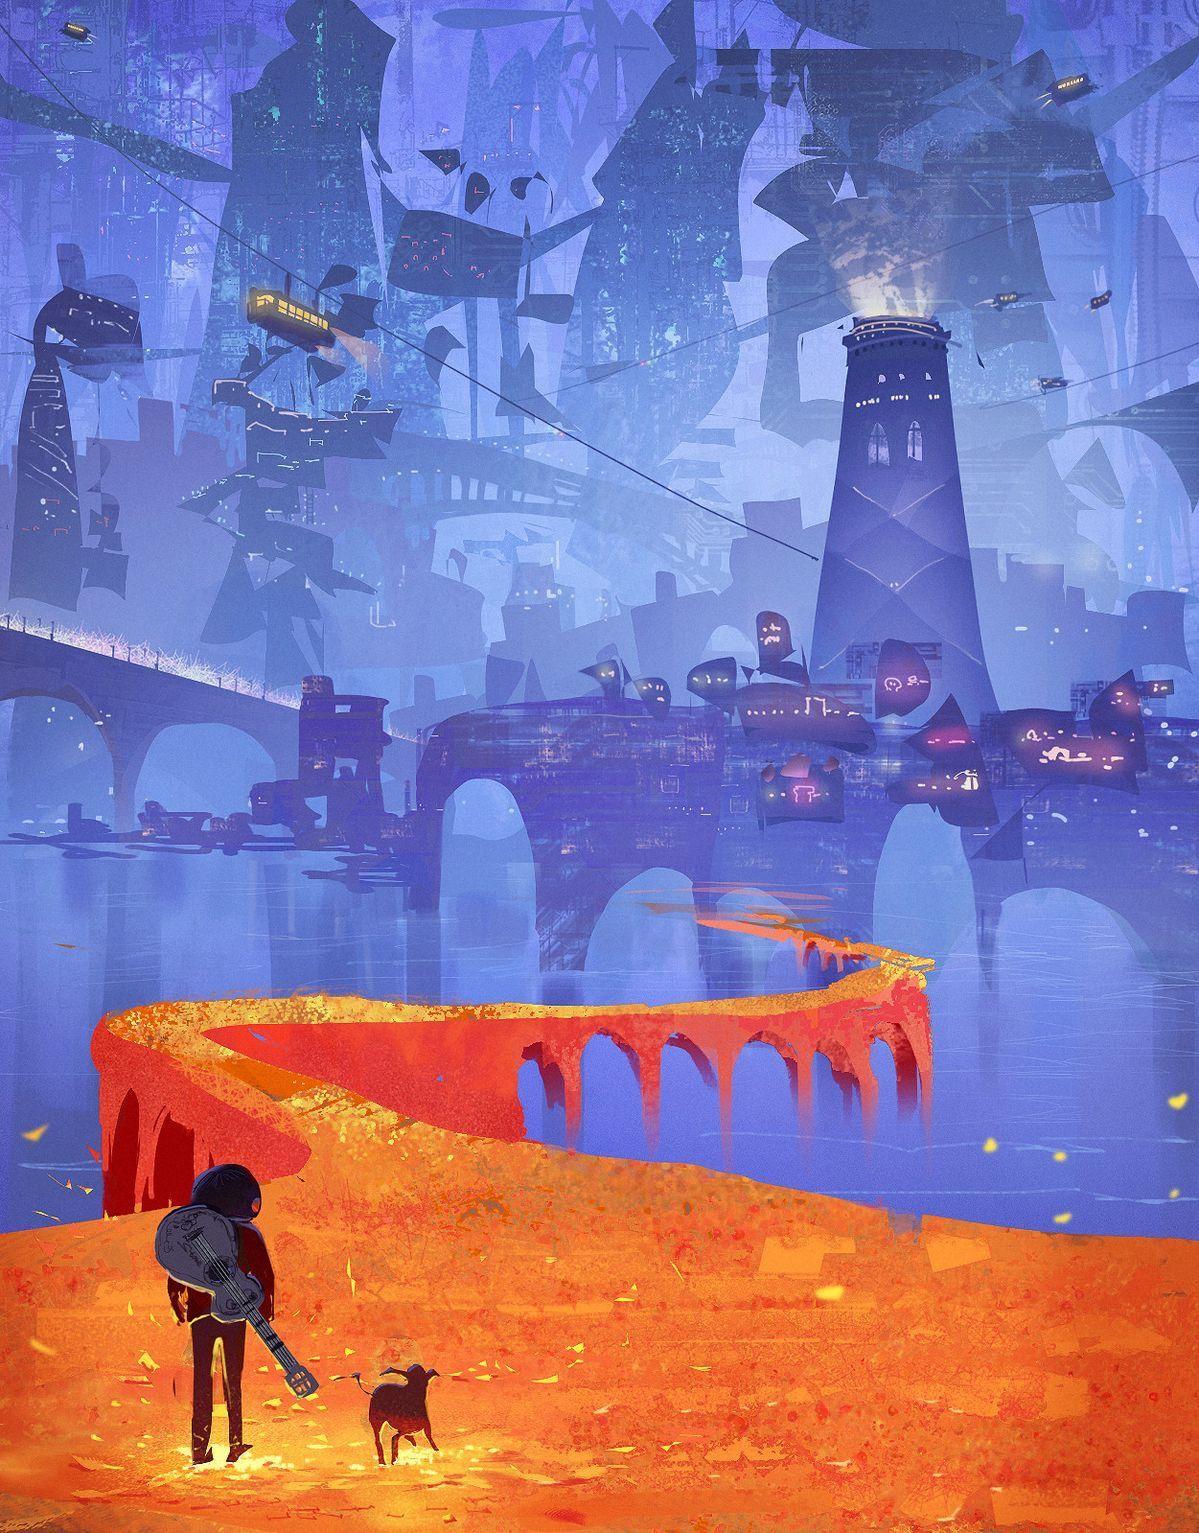 The Marigold Road In Coco Disney Pixar Disney Art Disney Wallpaper